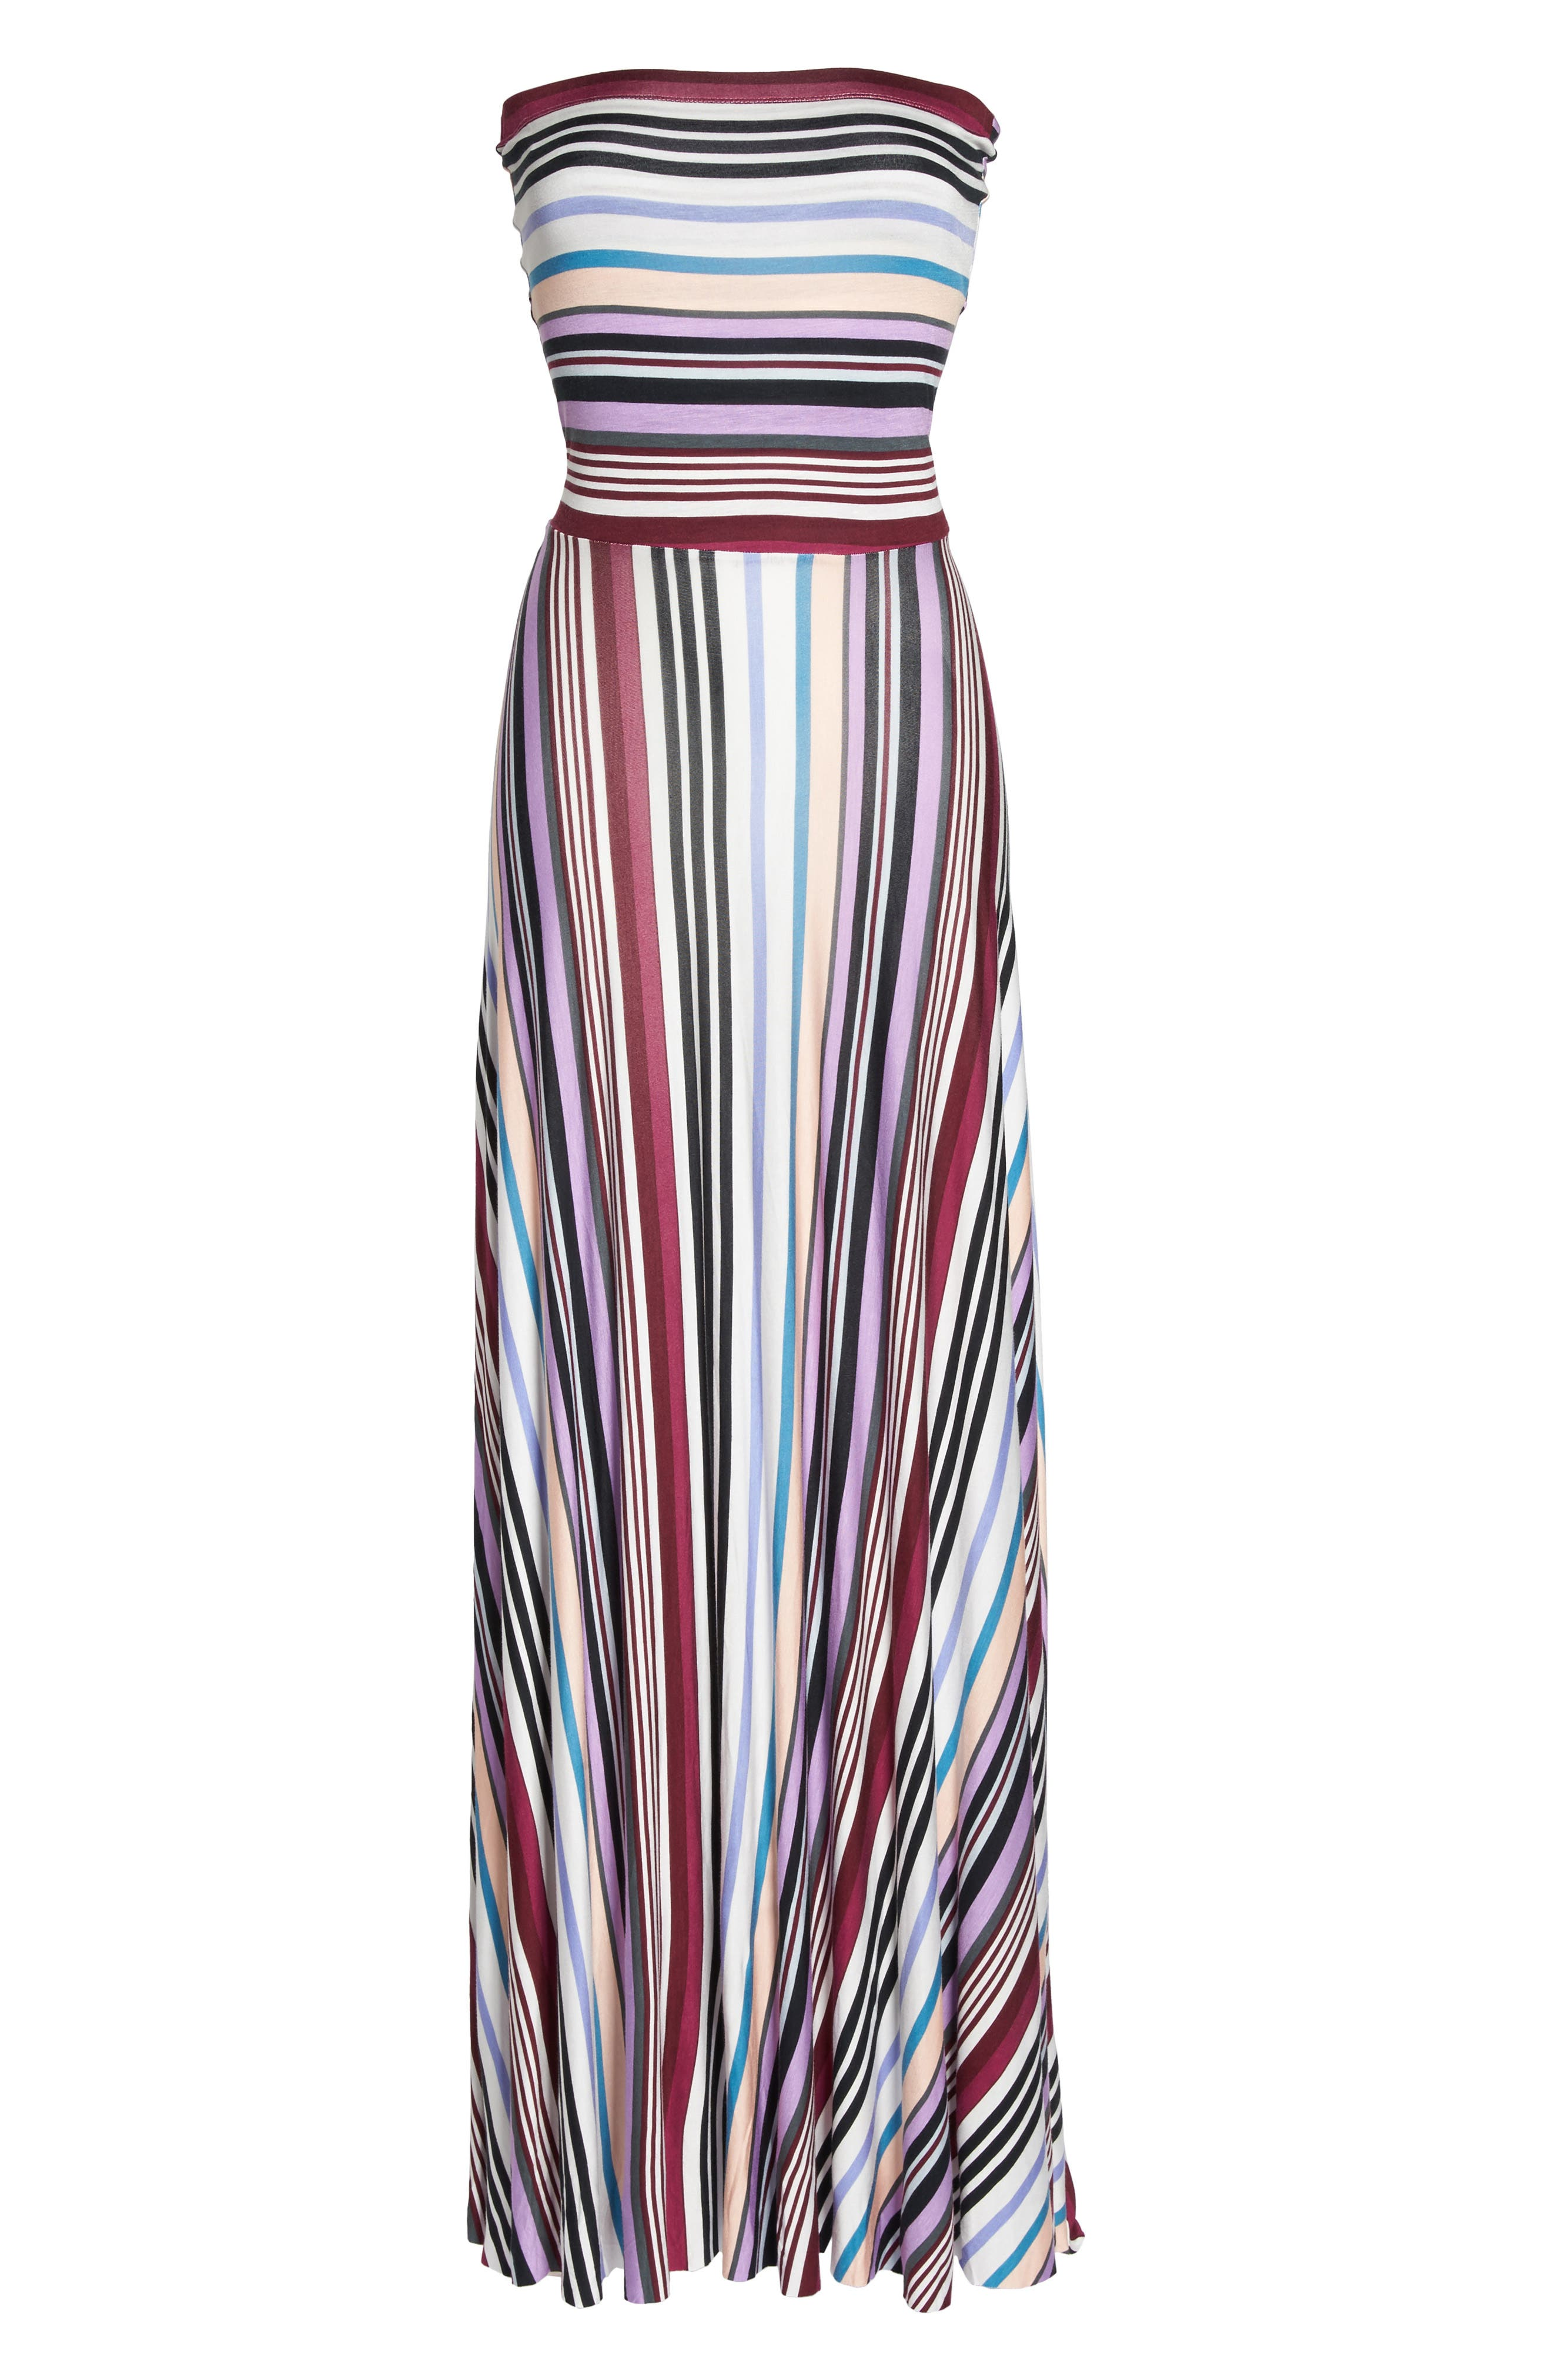 Clemette Strapless Maxi Dress,                             Alternate thumbnail 7, color,                             Purple Multi Stripe